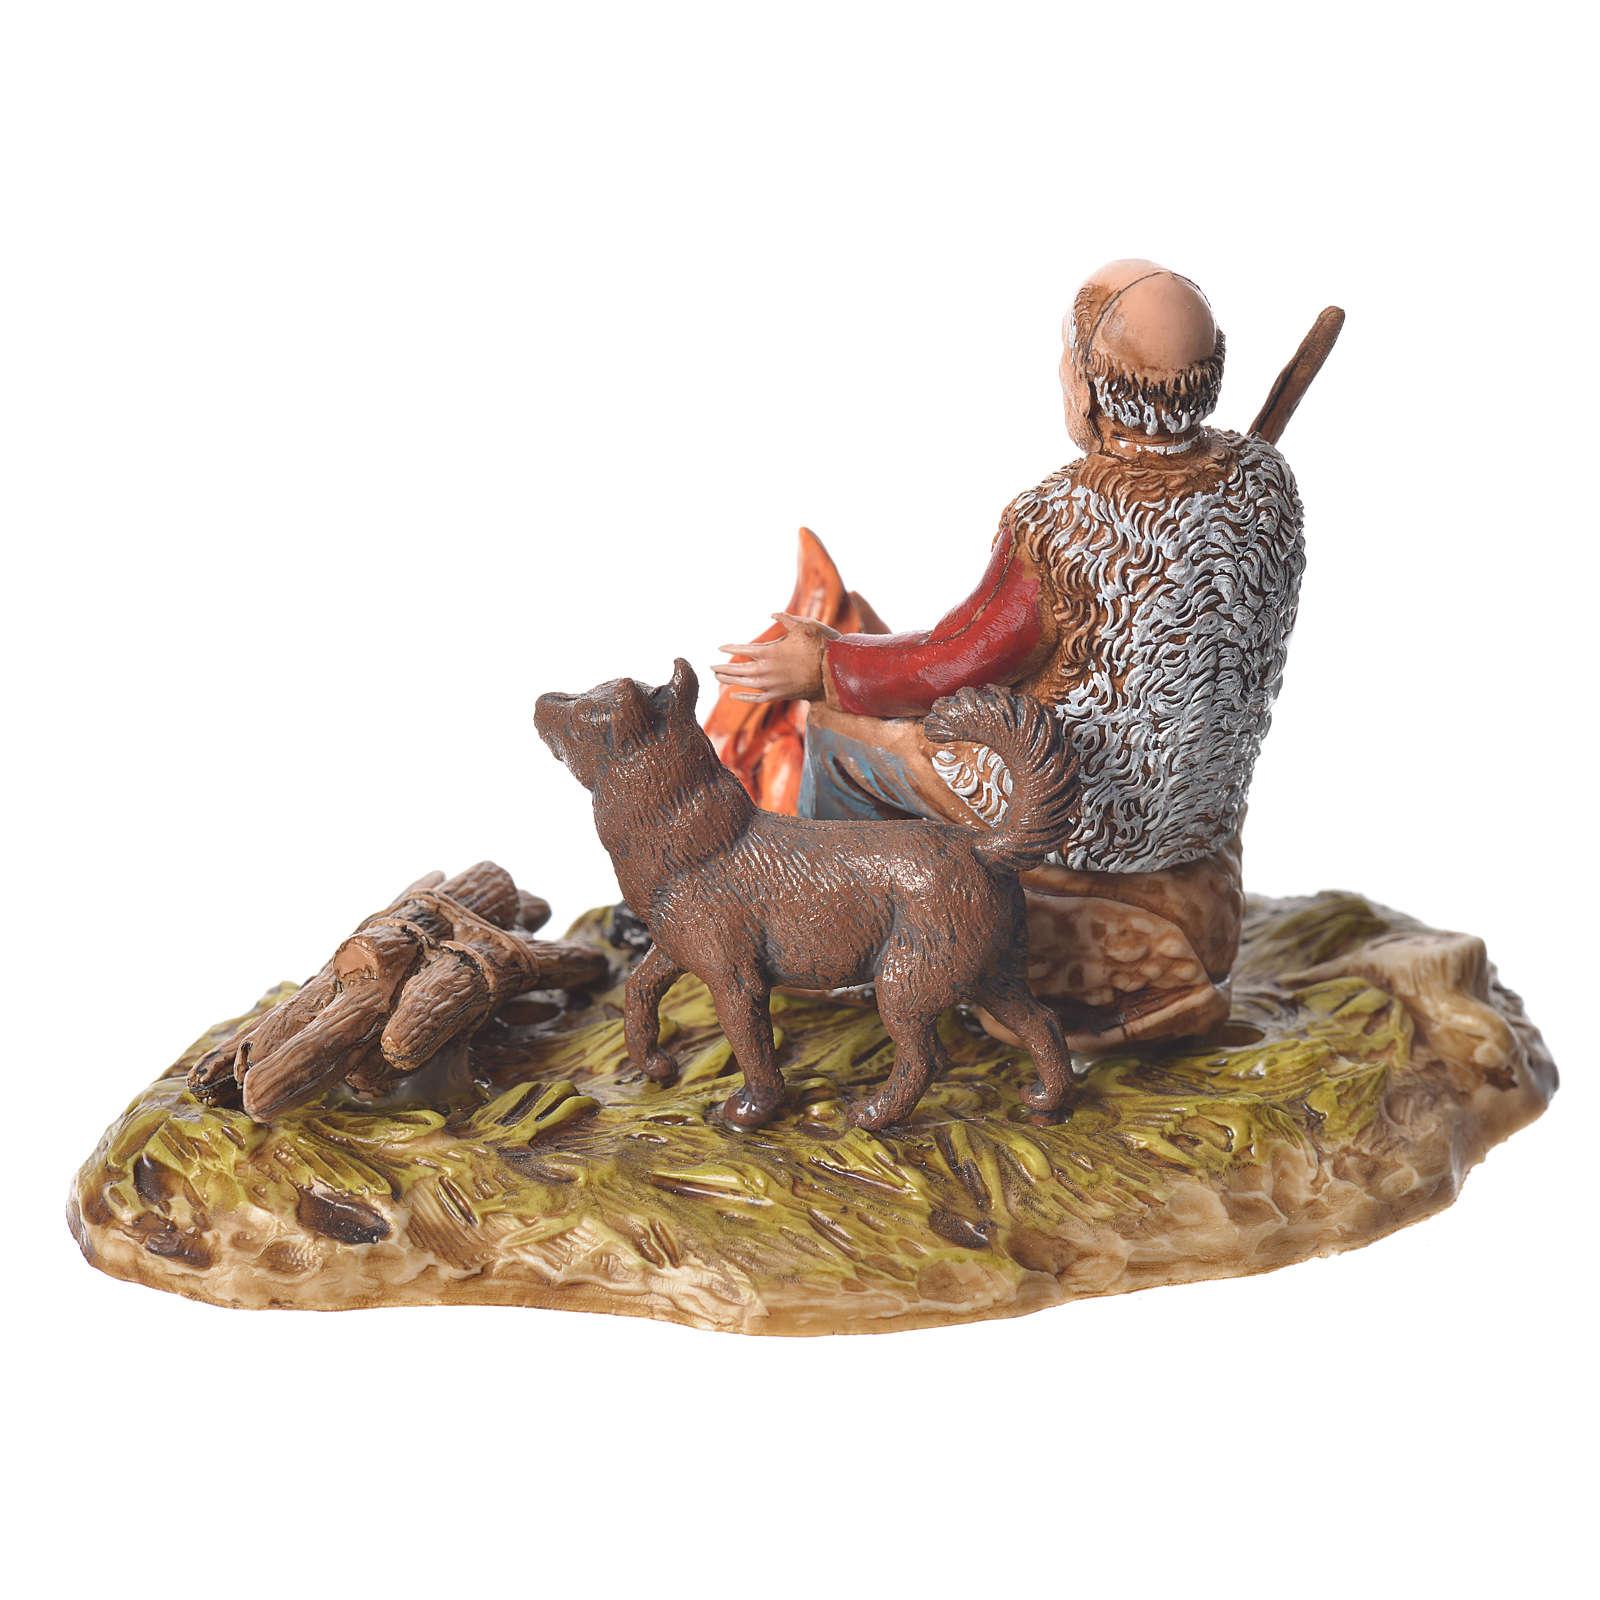 Man with fire nativity figurine, 10cm Moranduzzo 4